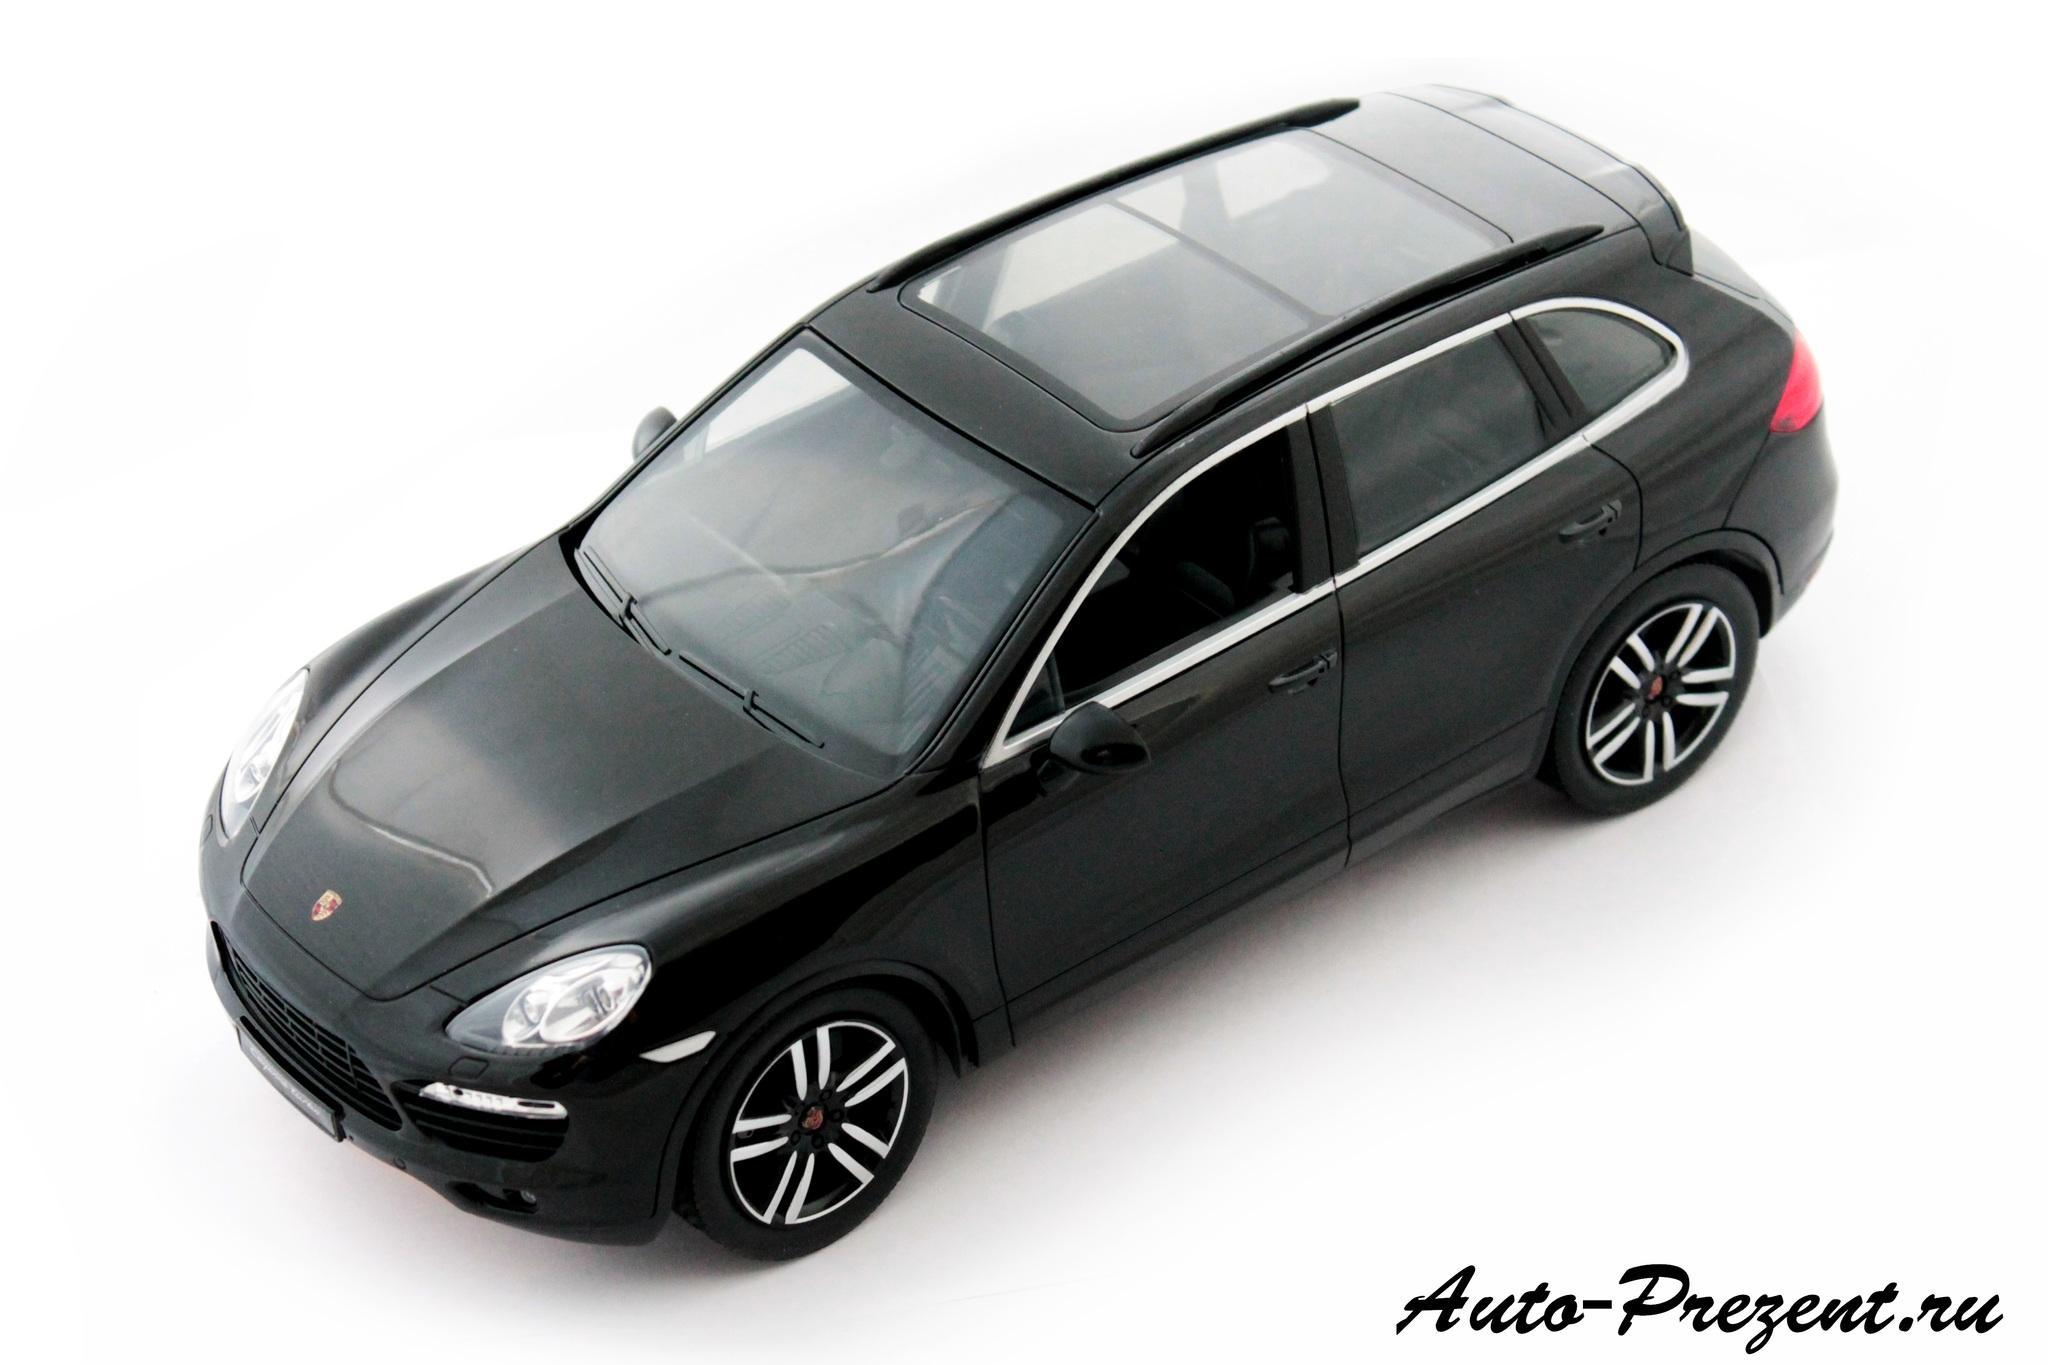 Машинка Porsche Cayenne Turbo на радиоуправлении